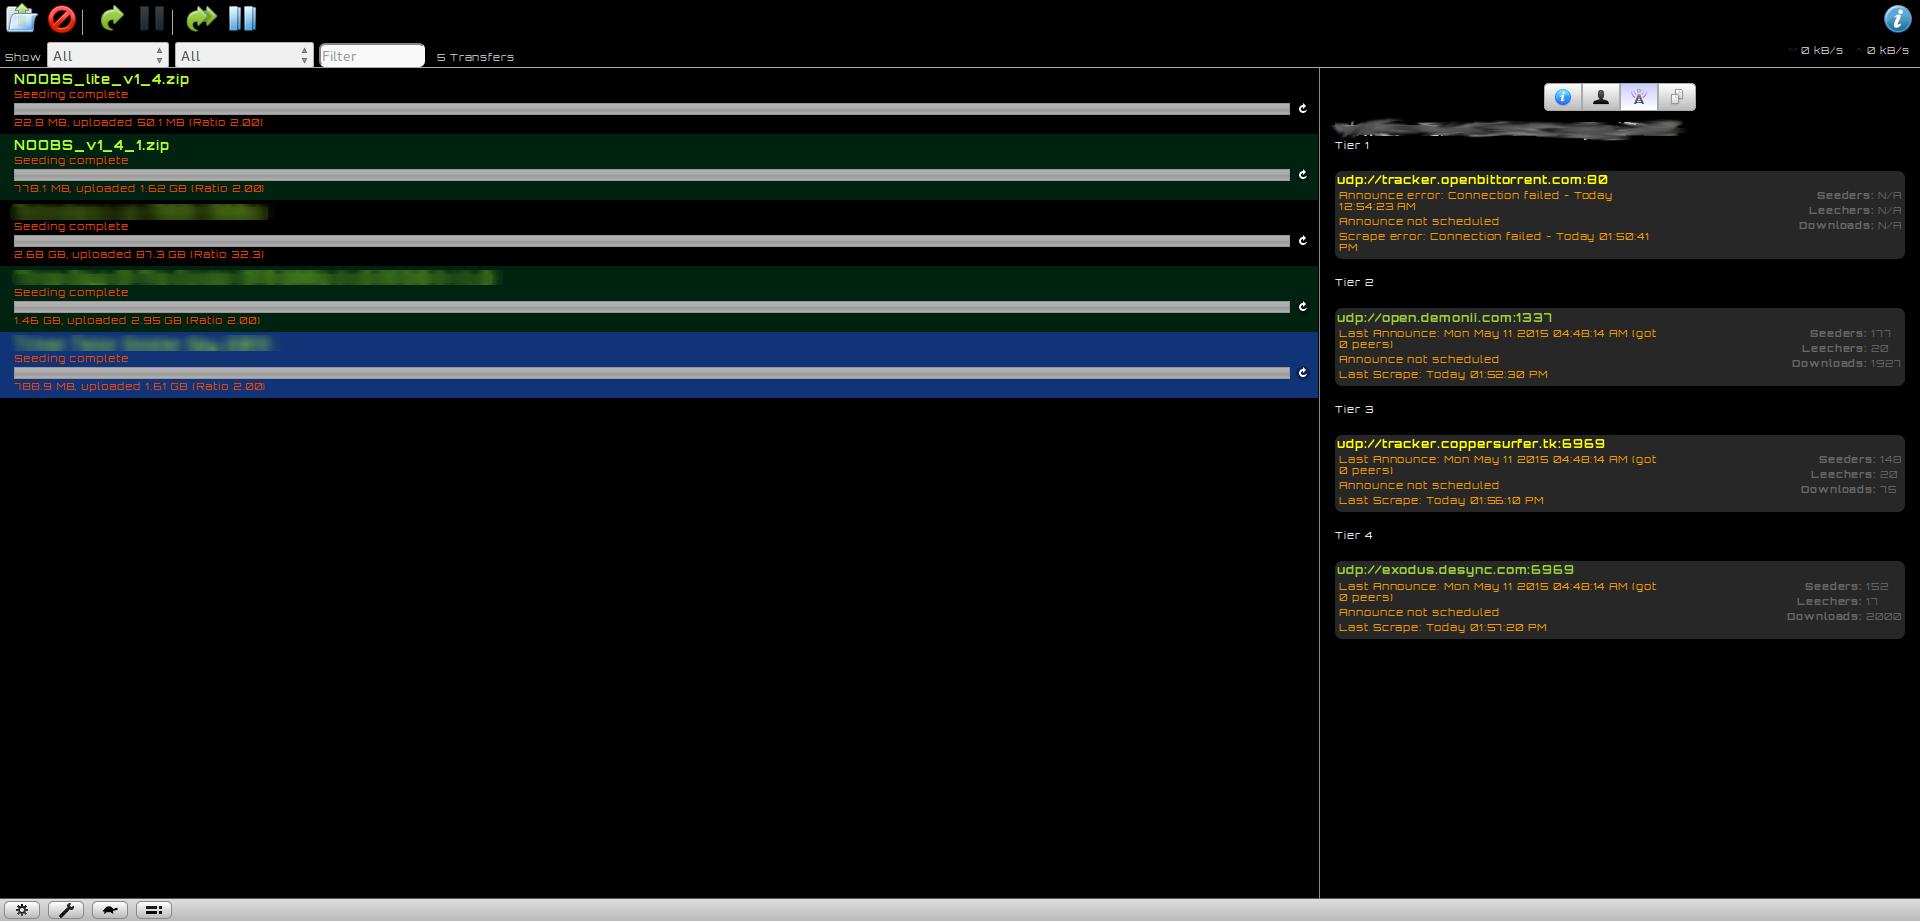 screenshot-transmission dark theme totallynoob specktator 9091 2015-05-31 12-06-58